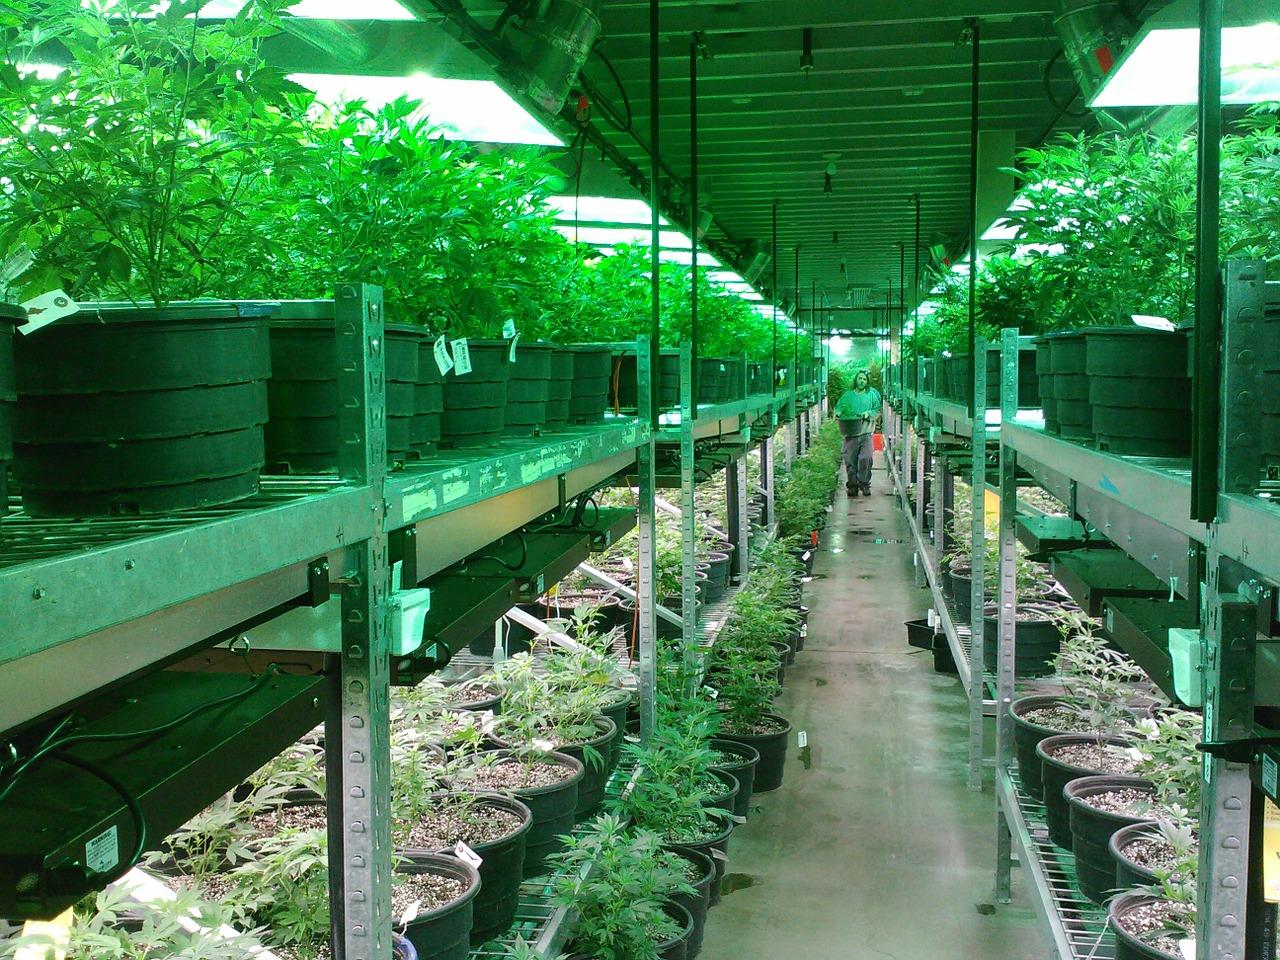 Cannabis POS Provider Green Bits Raises $2.2 Million